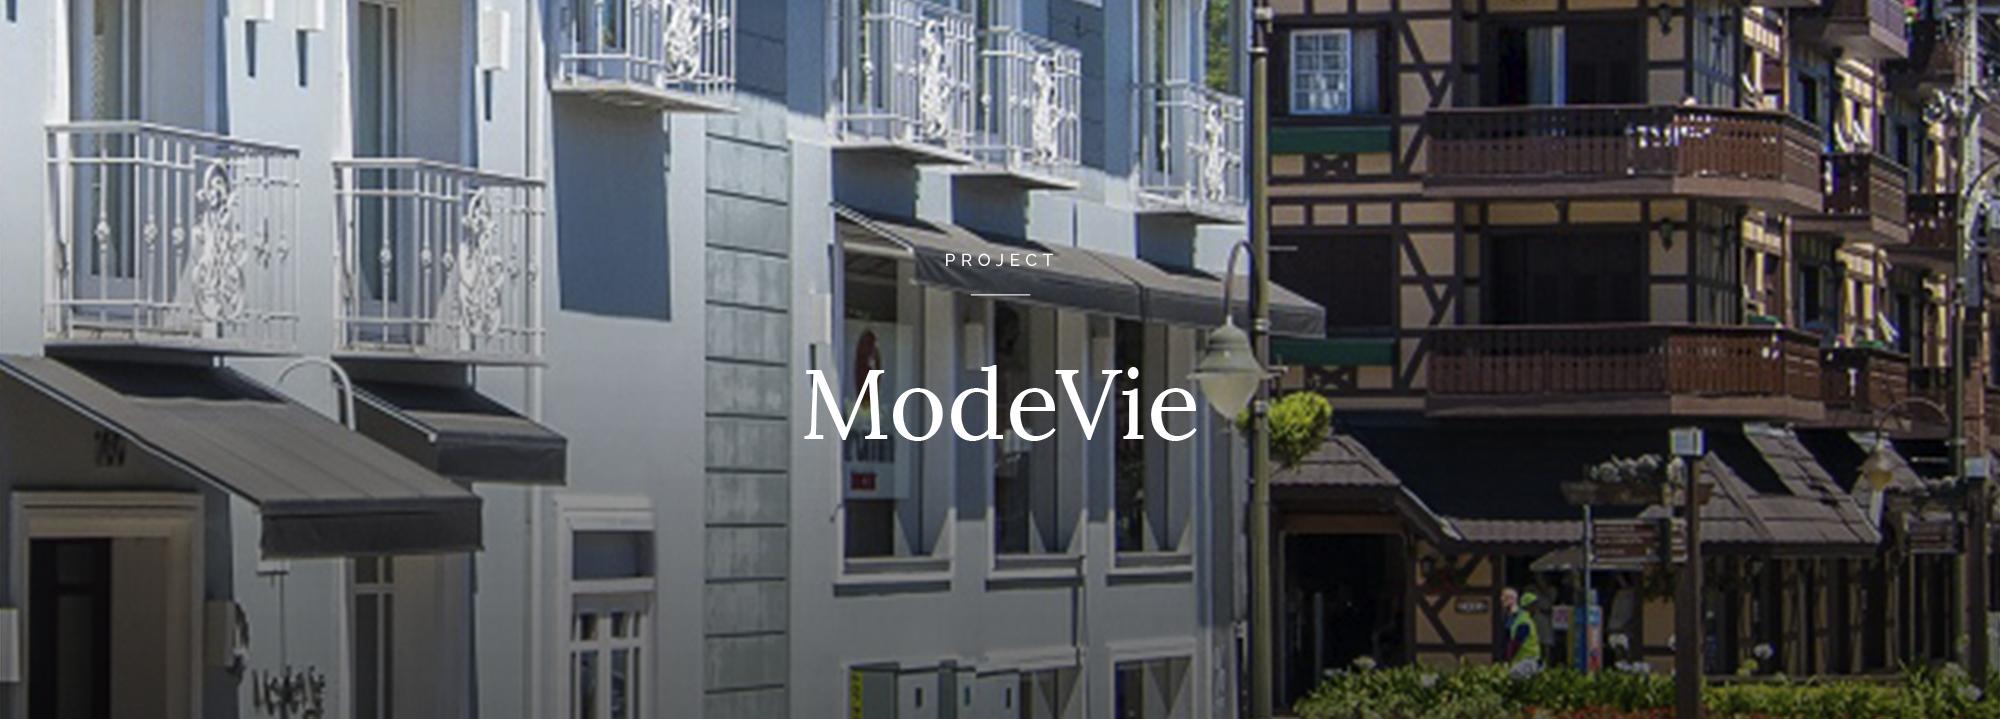 ModeVie